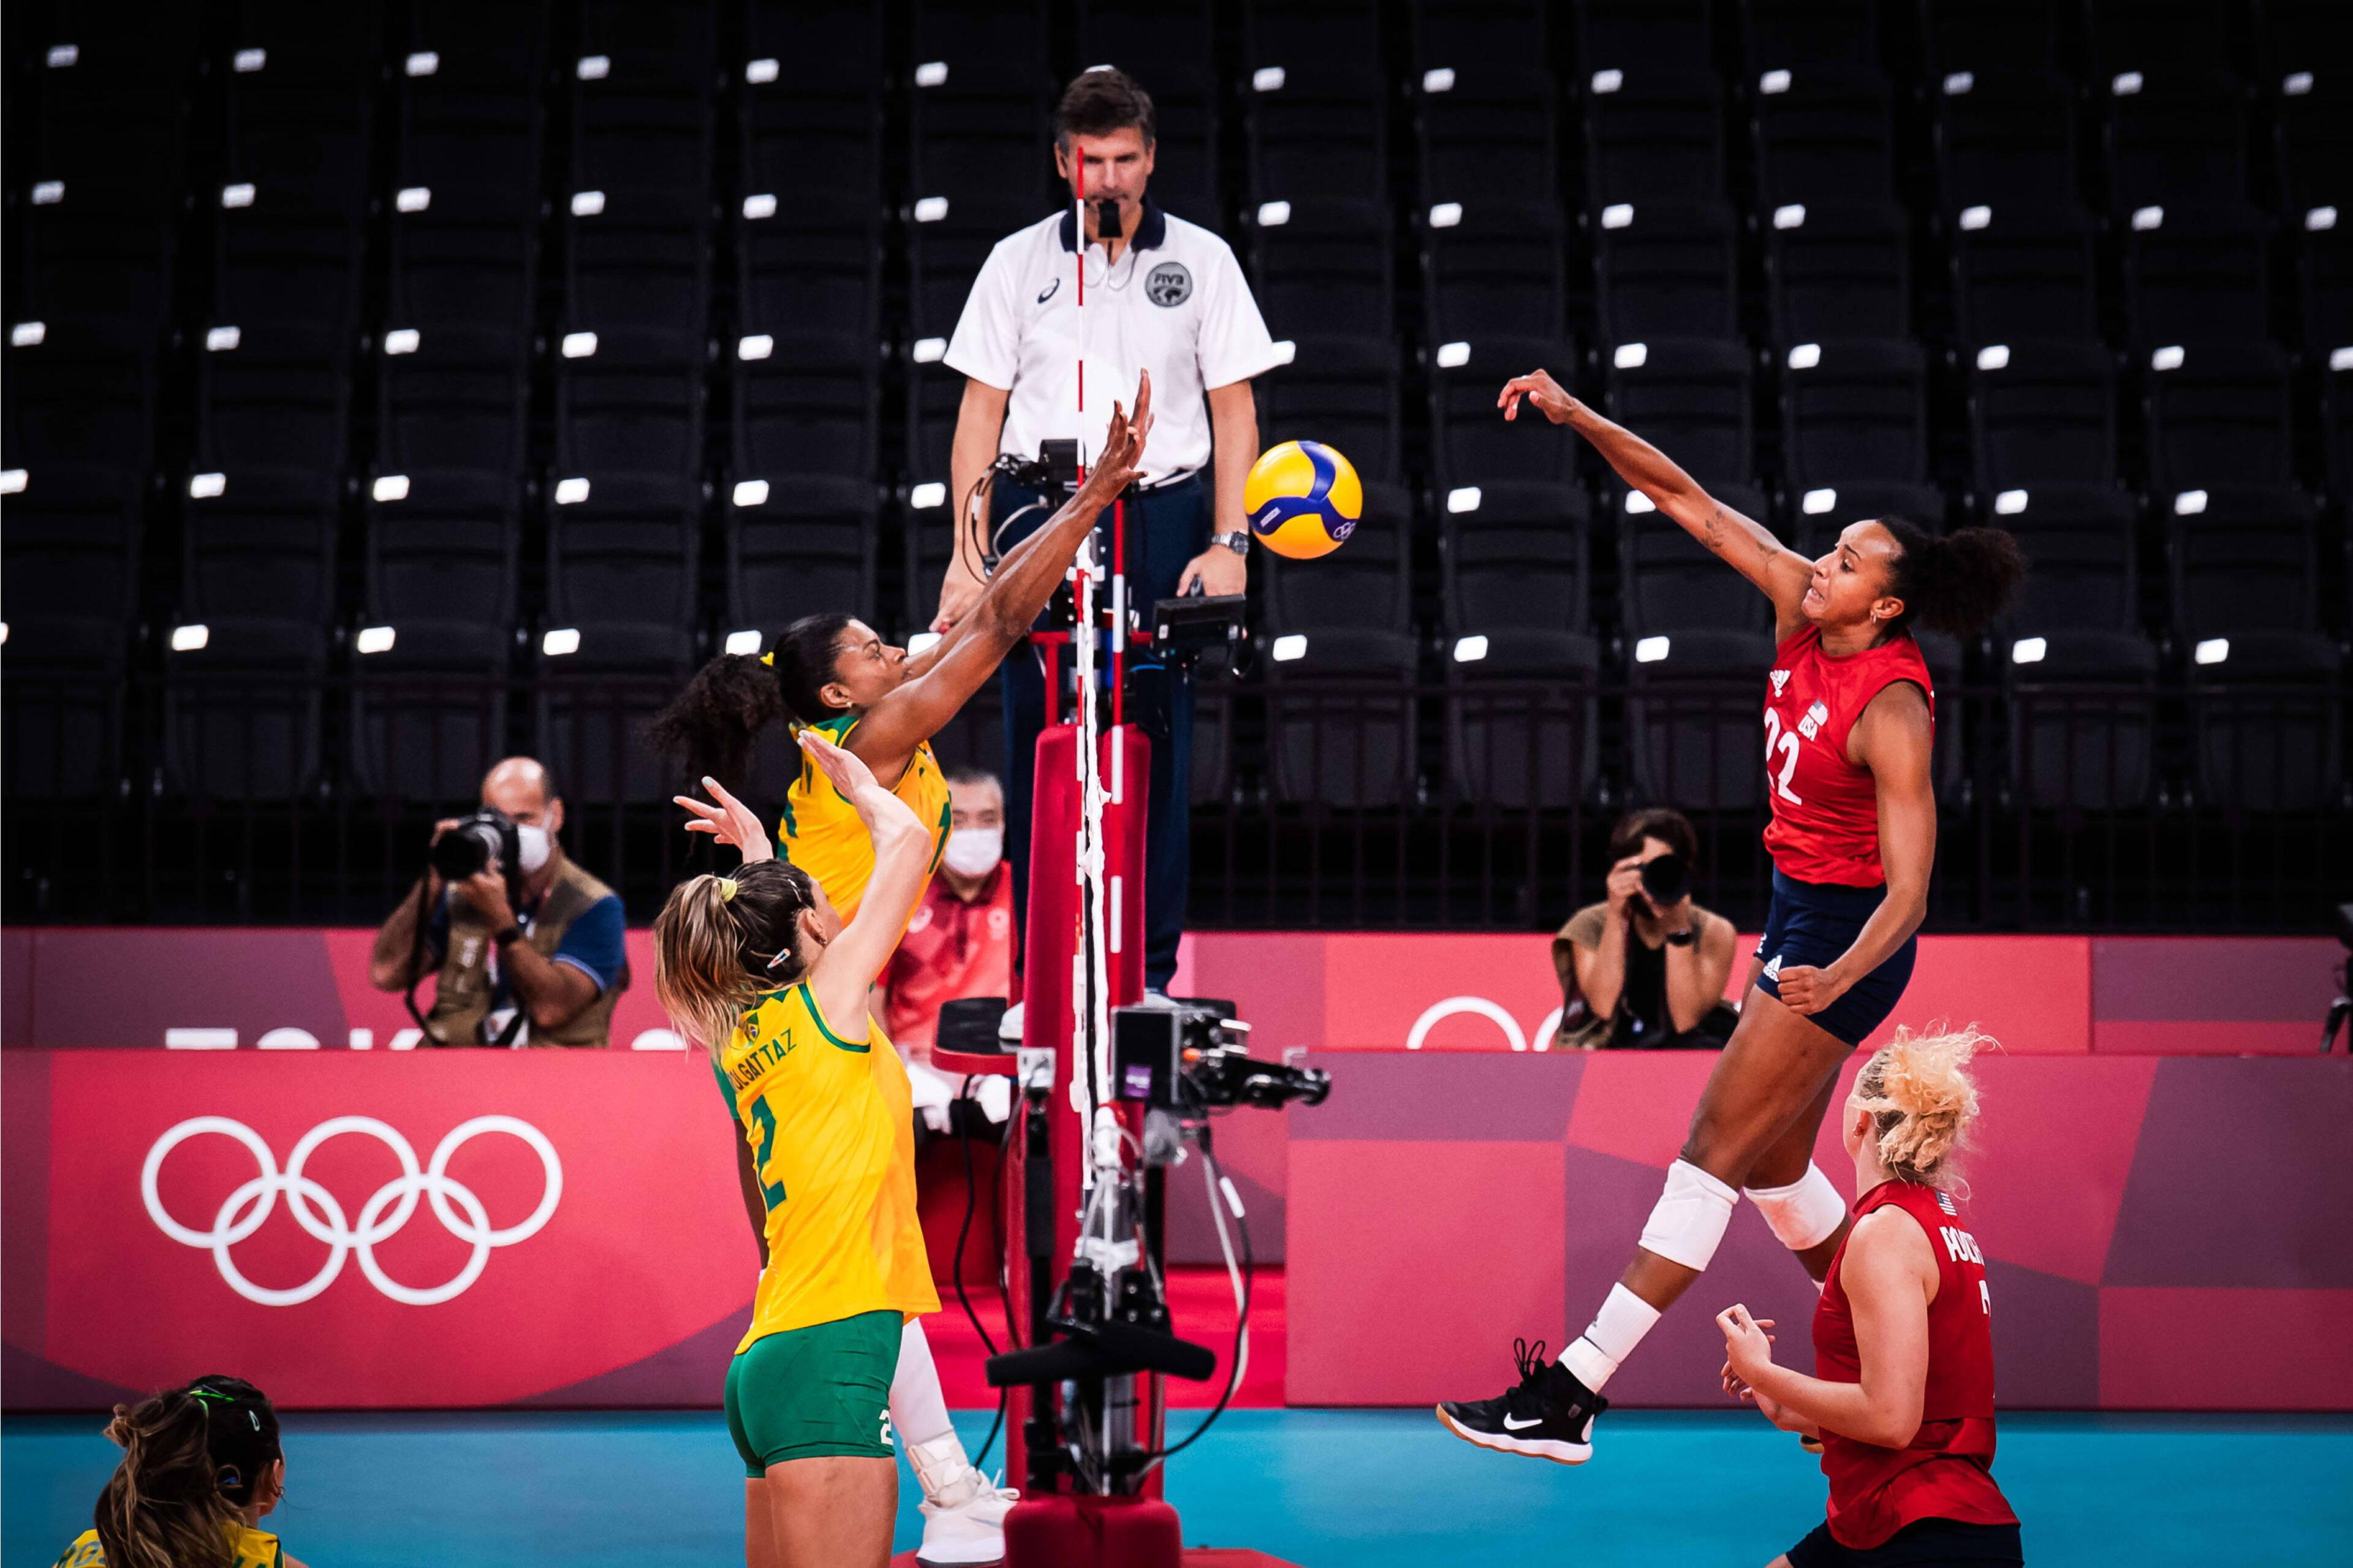 Brasil x EUA - vôlei feminino - Olimpíadas Tóquio. Foto: FIVB / Divulgação / Time Brasil